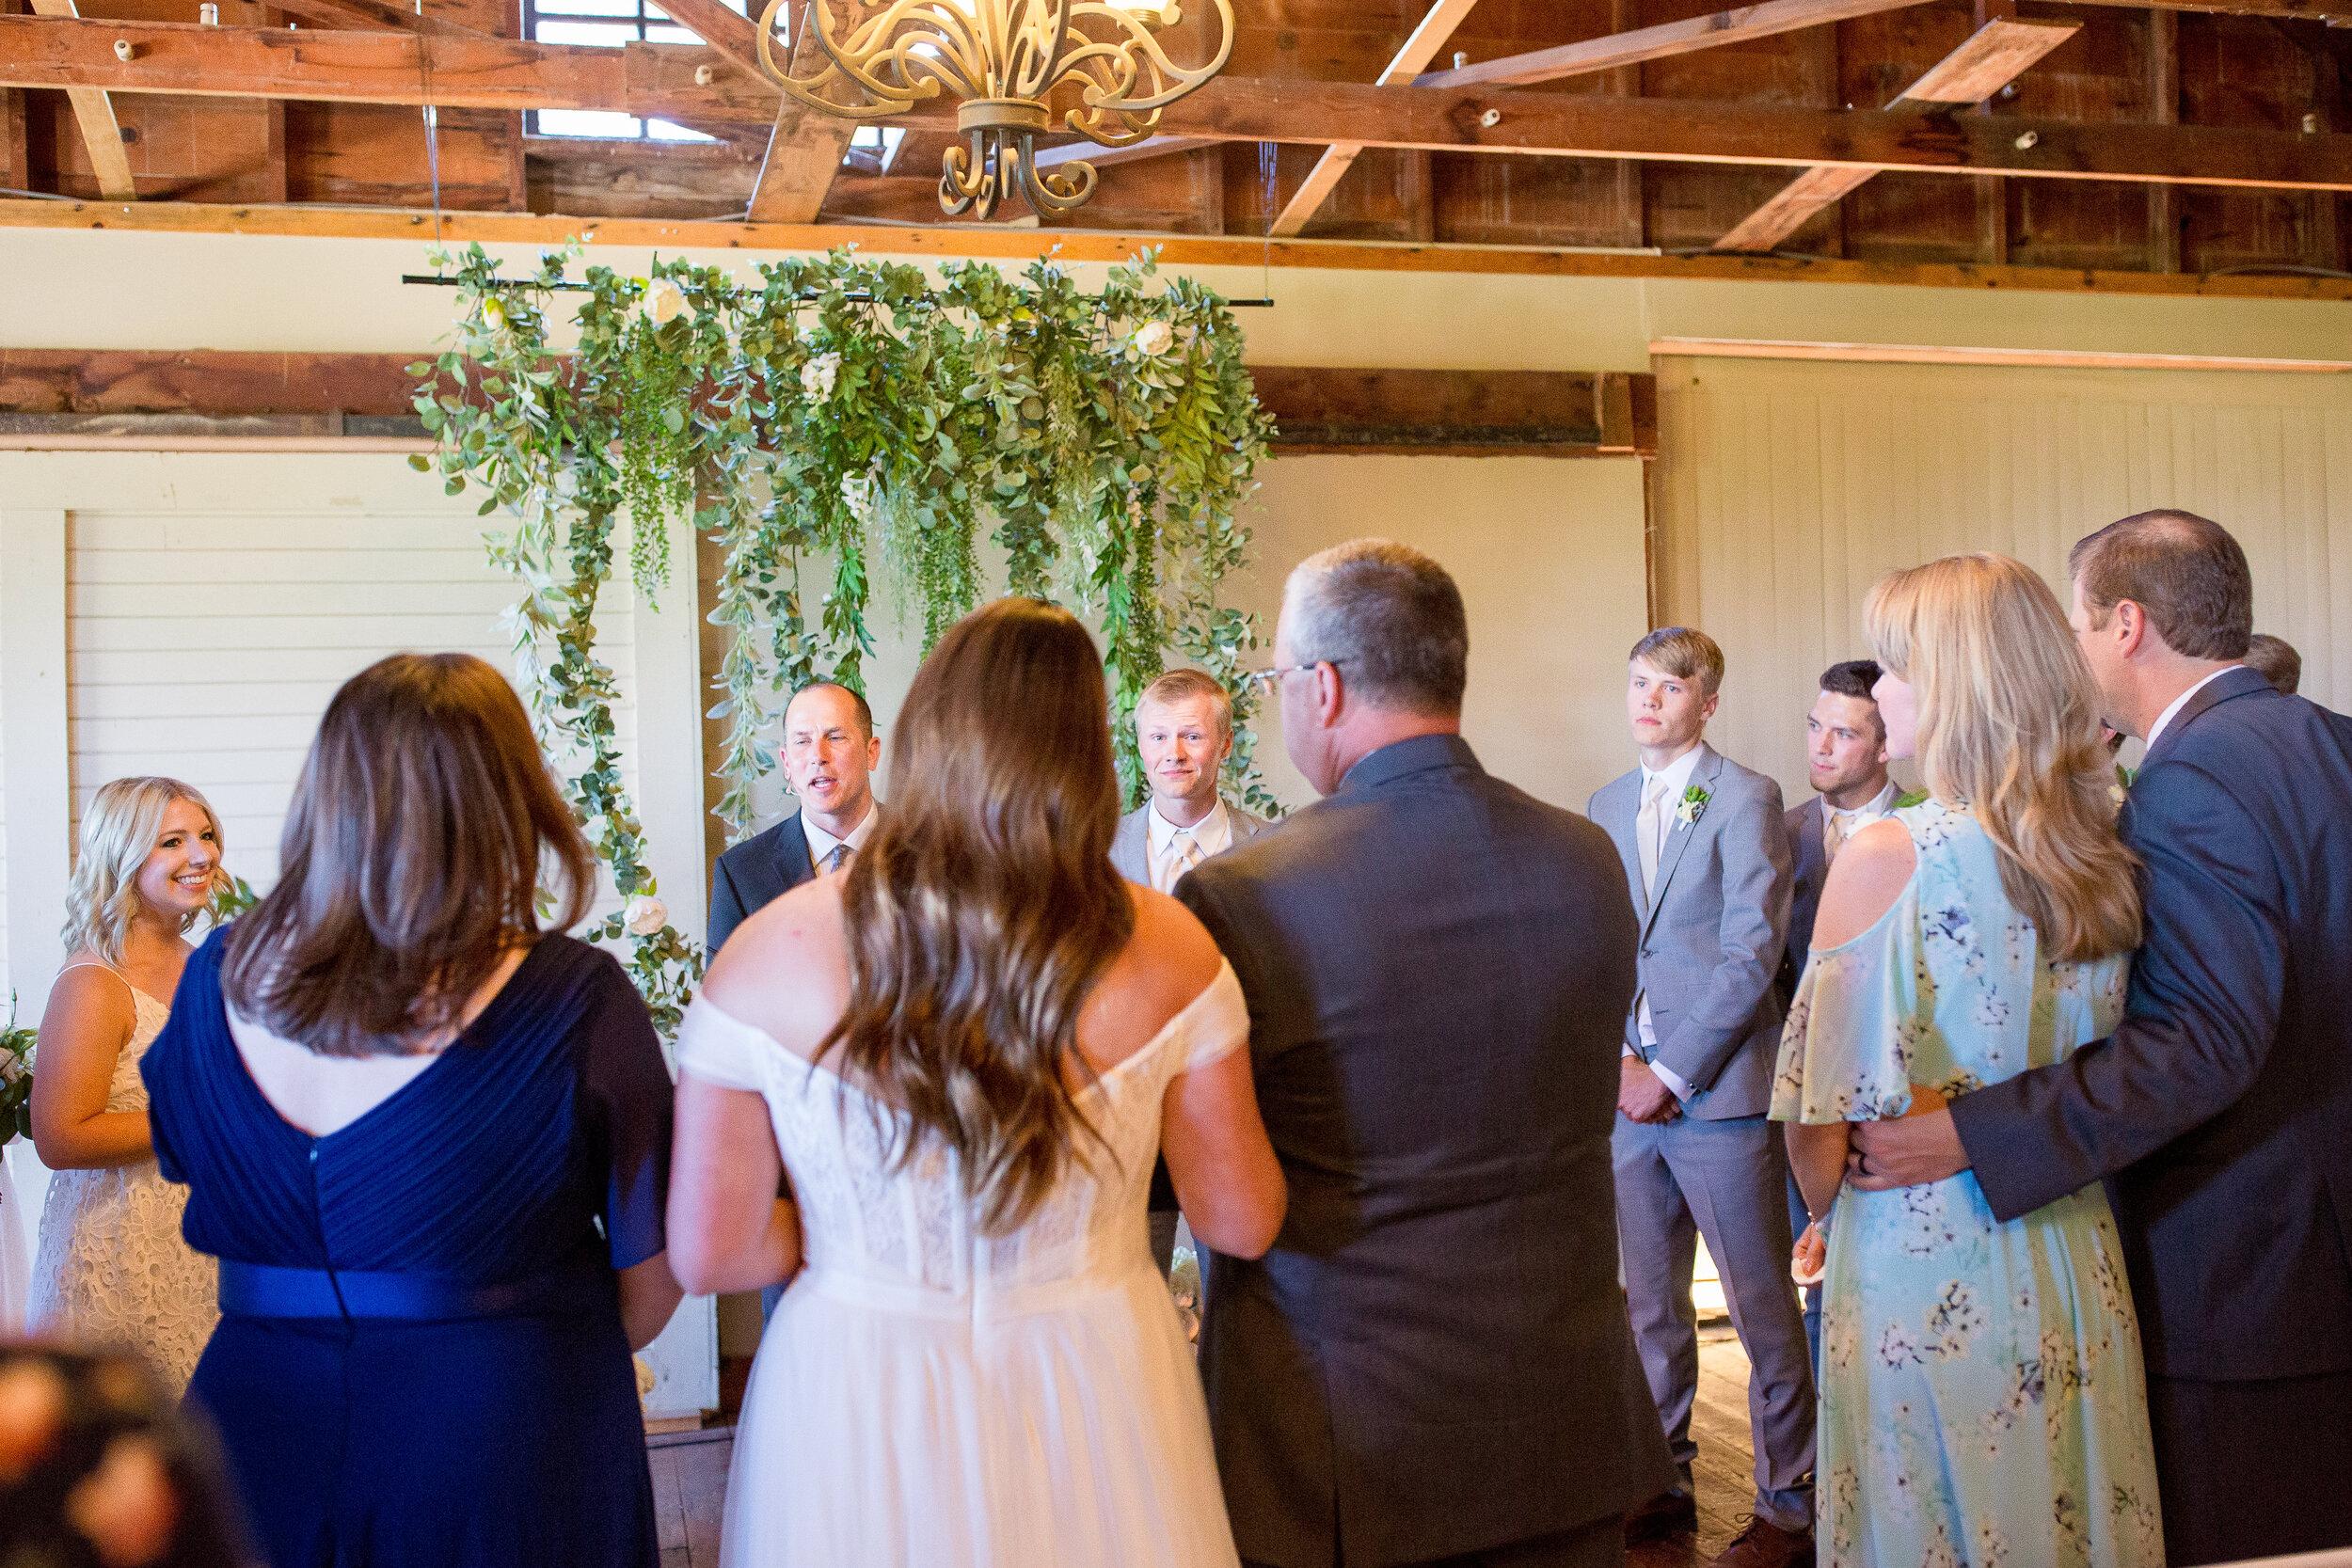 giving bride away spokane ceremony